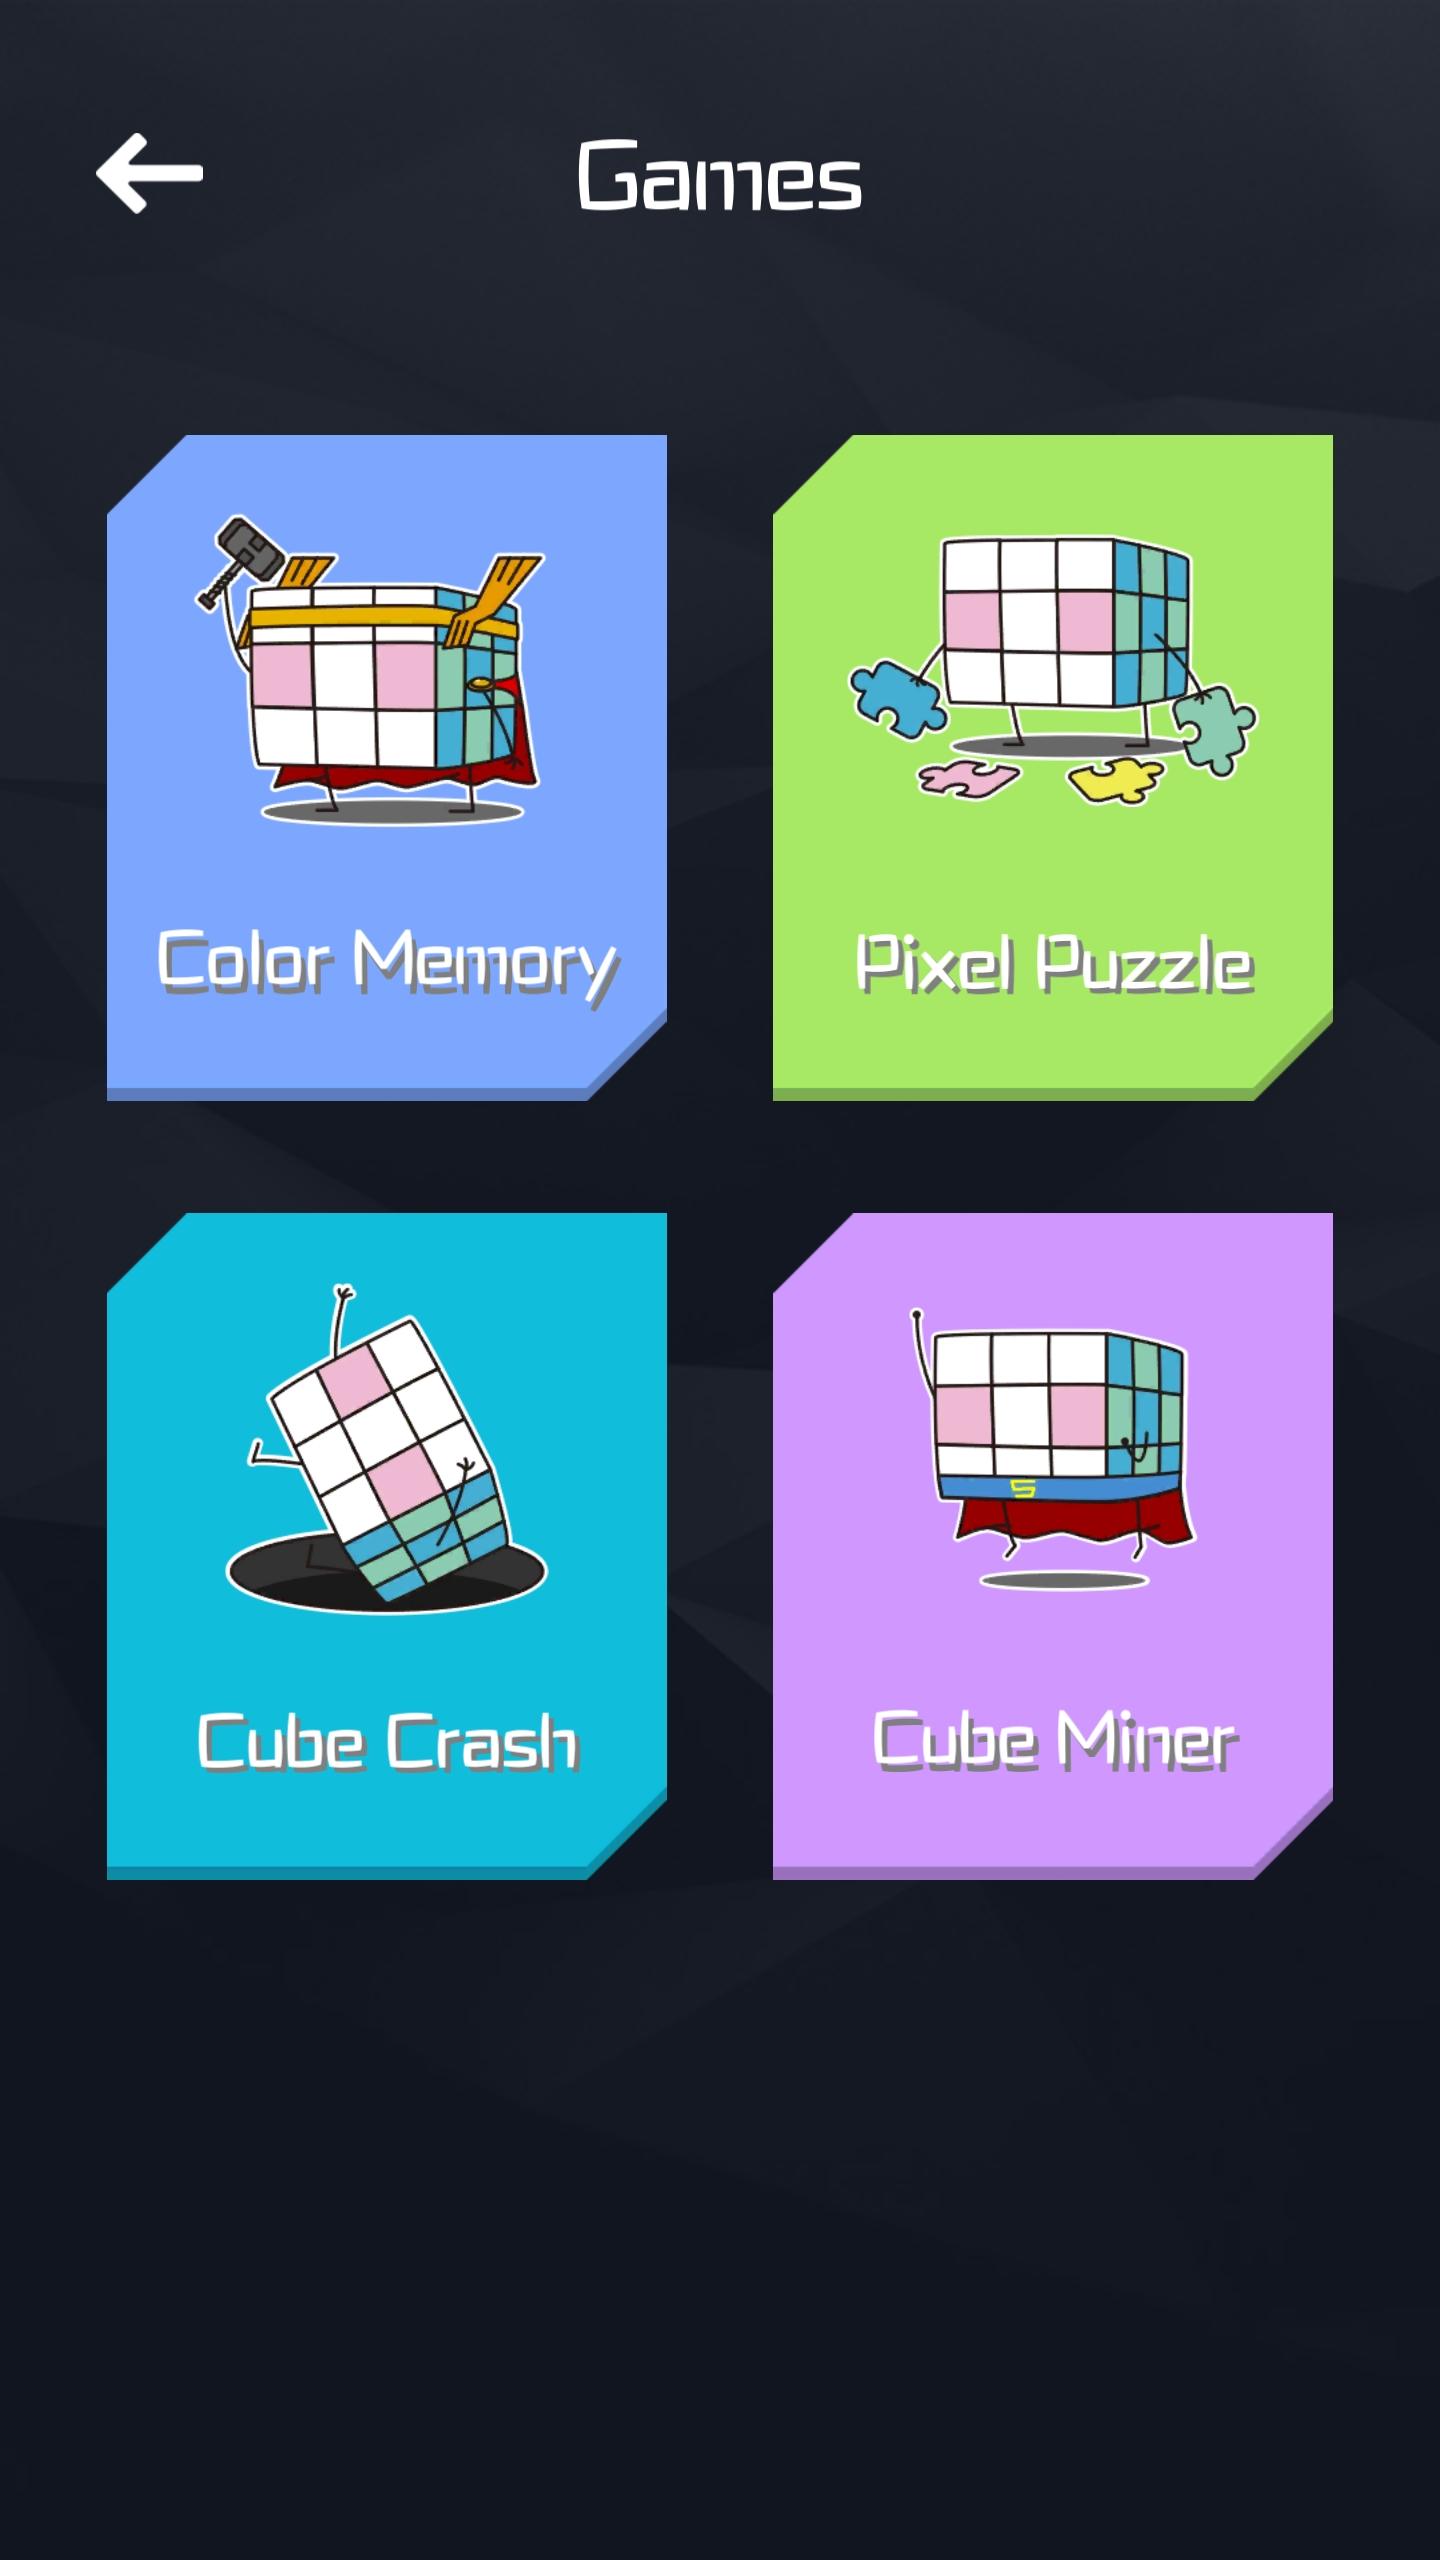 xiaomi-rubik-kocka-giiker-geeker-okoskocka-varazskocka-magic-cube-teszt-06